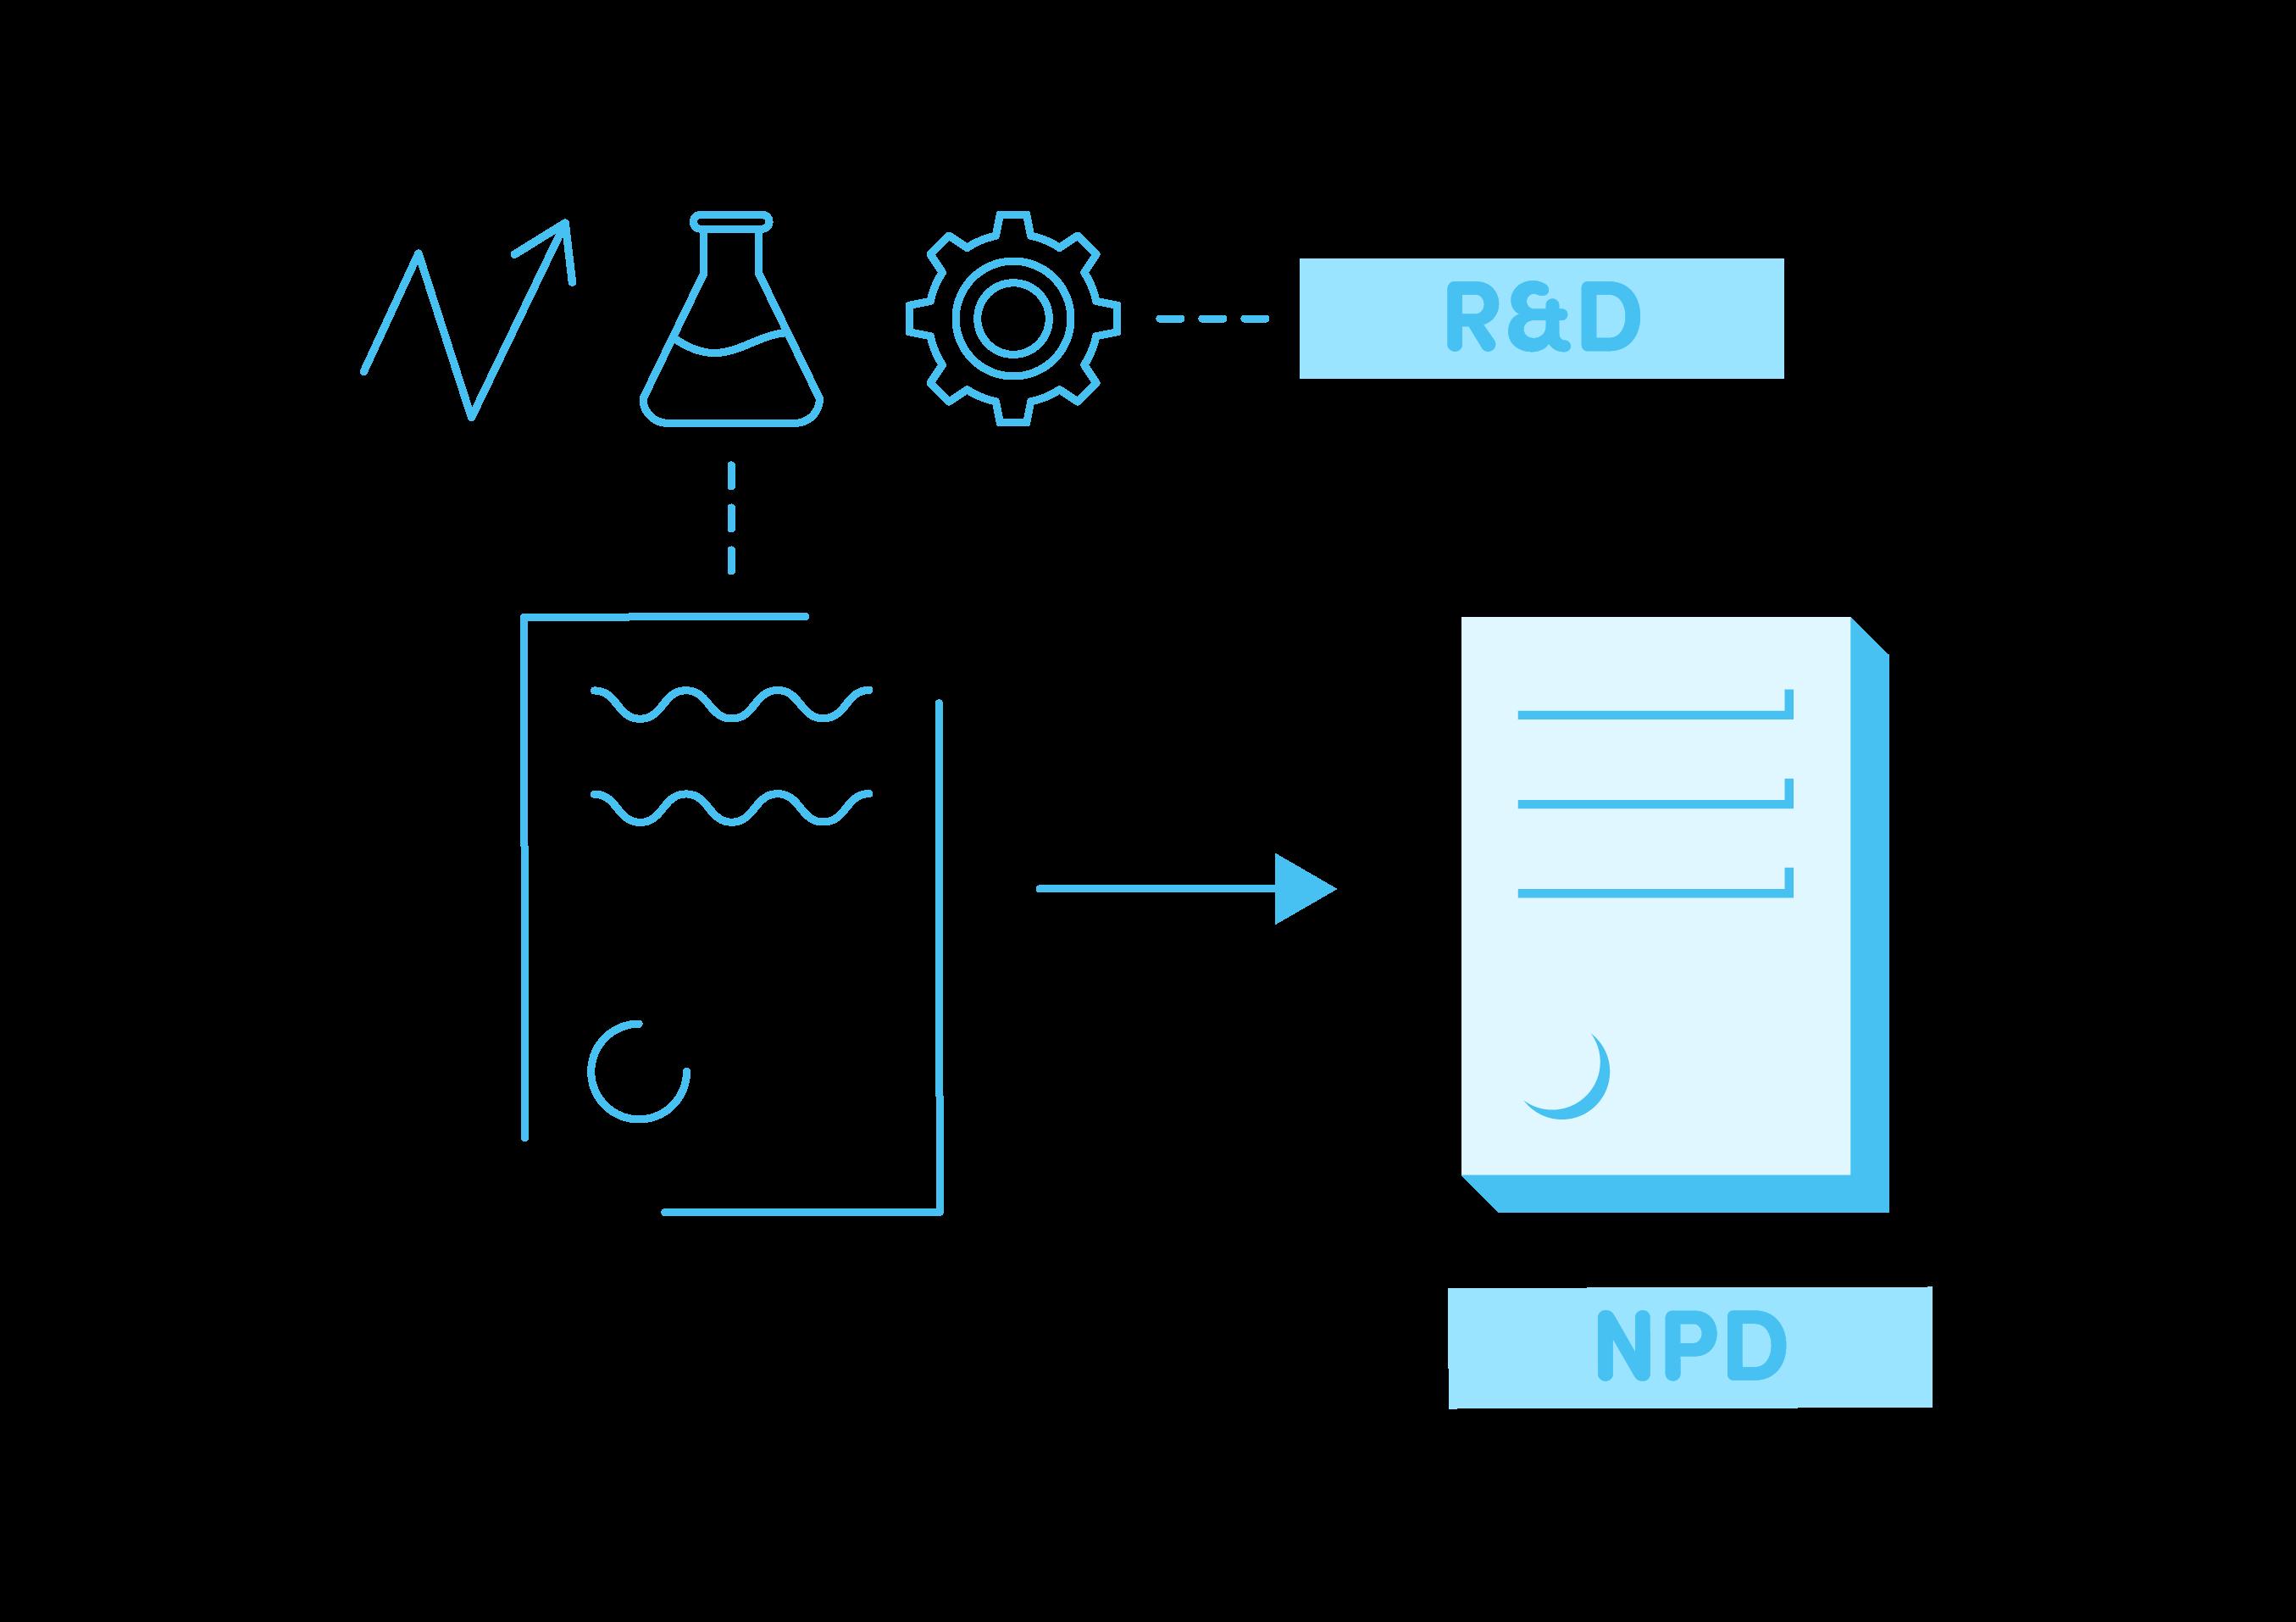 Is NPD part of R&D?